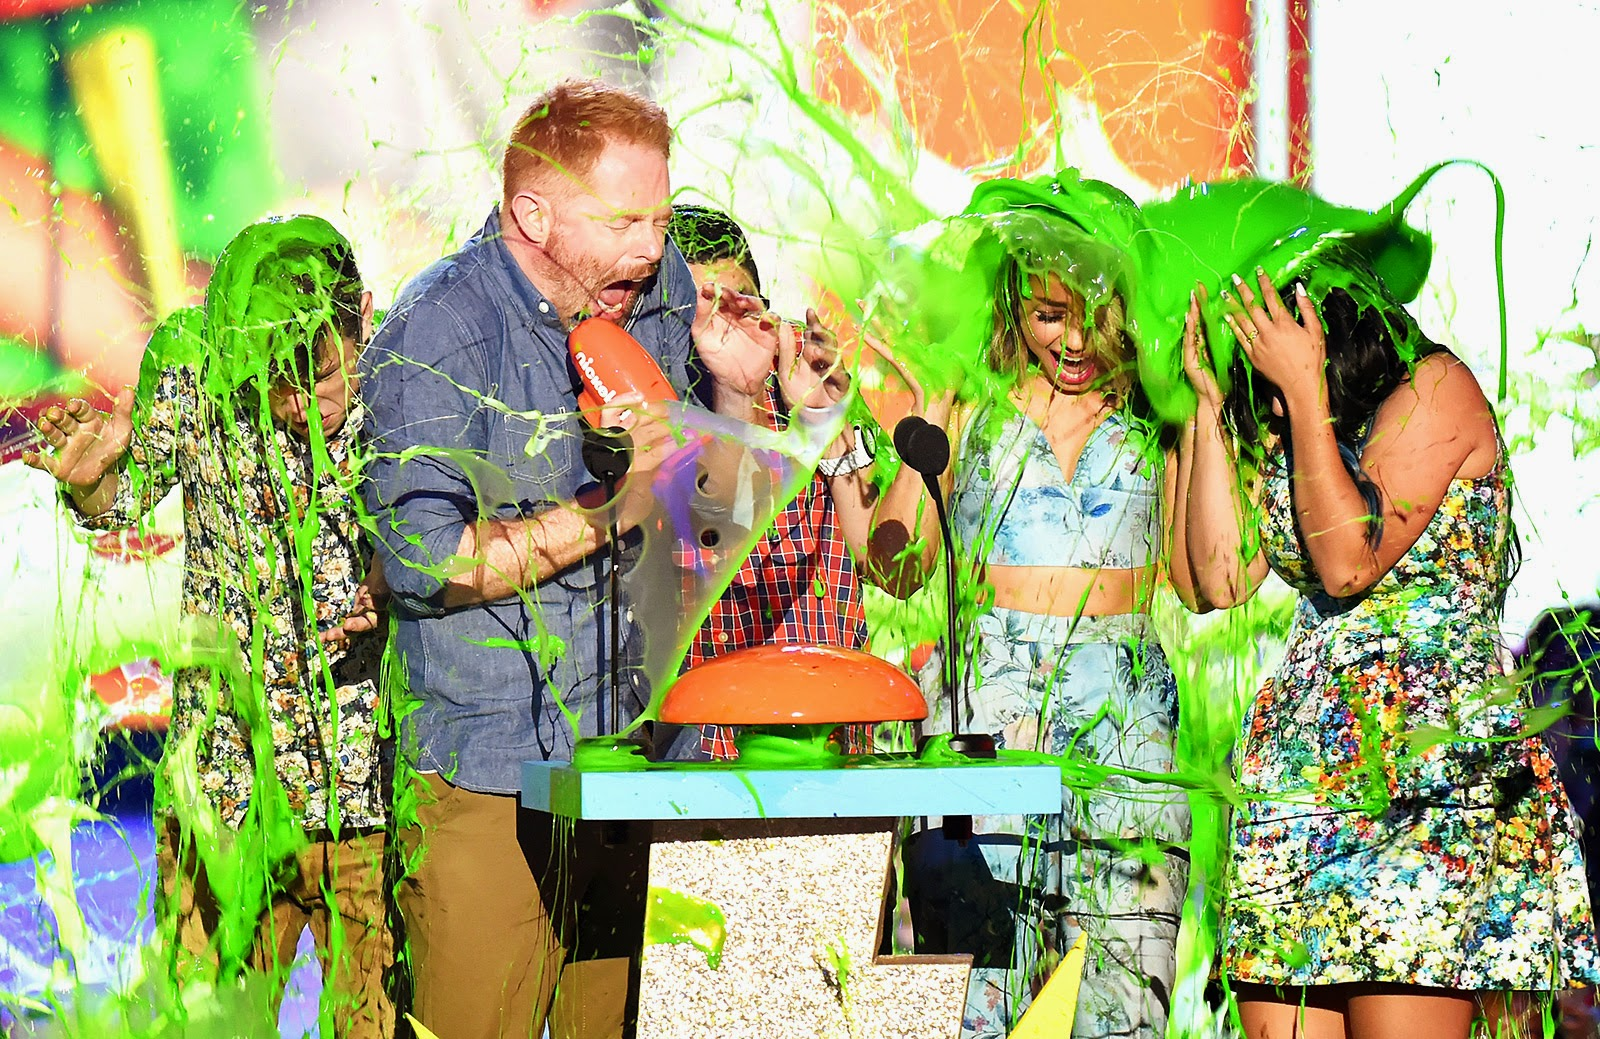 Sarah Hyland gets slimed at the 2015 Nickeldeon Kids' Choice Awards